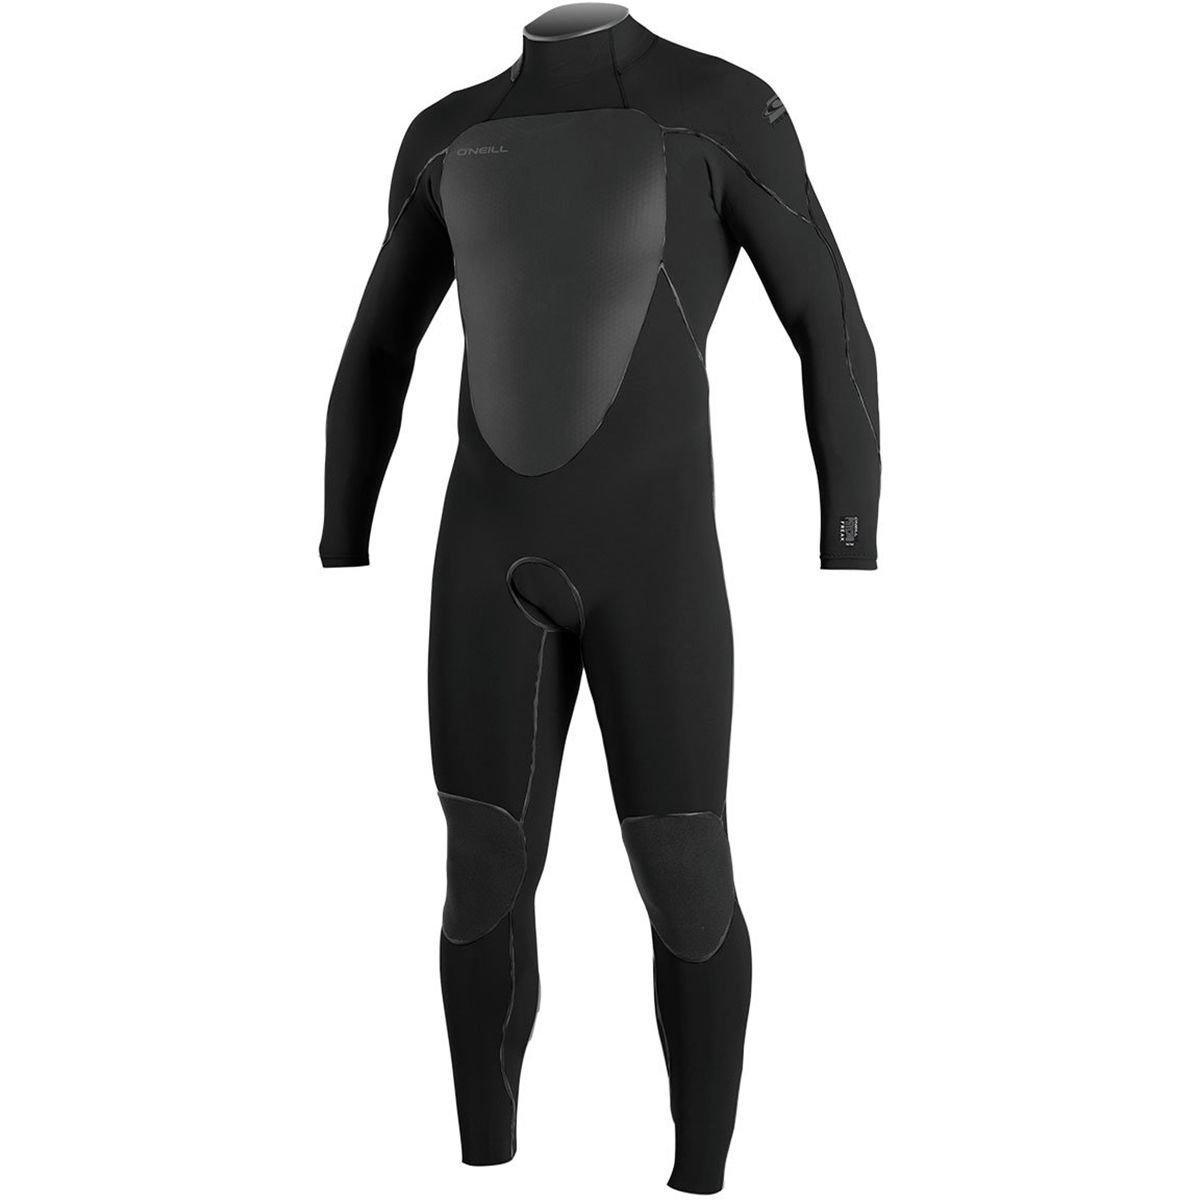 O ' Black Neillメンズpsycho-freak禅Zip O 3/ Black/Blackblack 2 SSWウェットスーツ B074L1S96V Black/Blackblack : Black 2X-Large 2X-Large|Black/Blackblack : Black, カミイソグン:b8b758e1 --- harrow-unison.org.uk